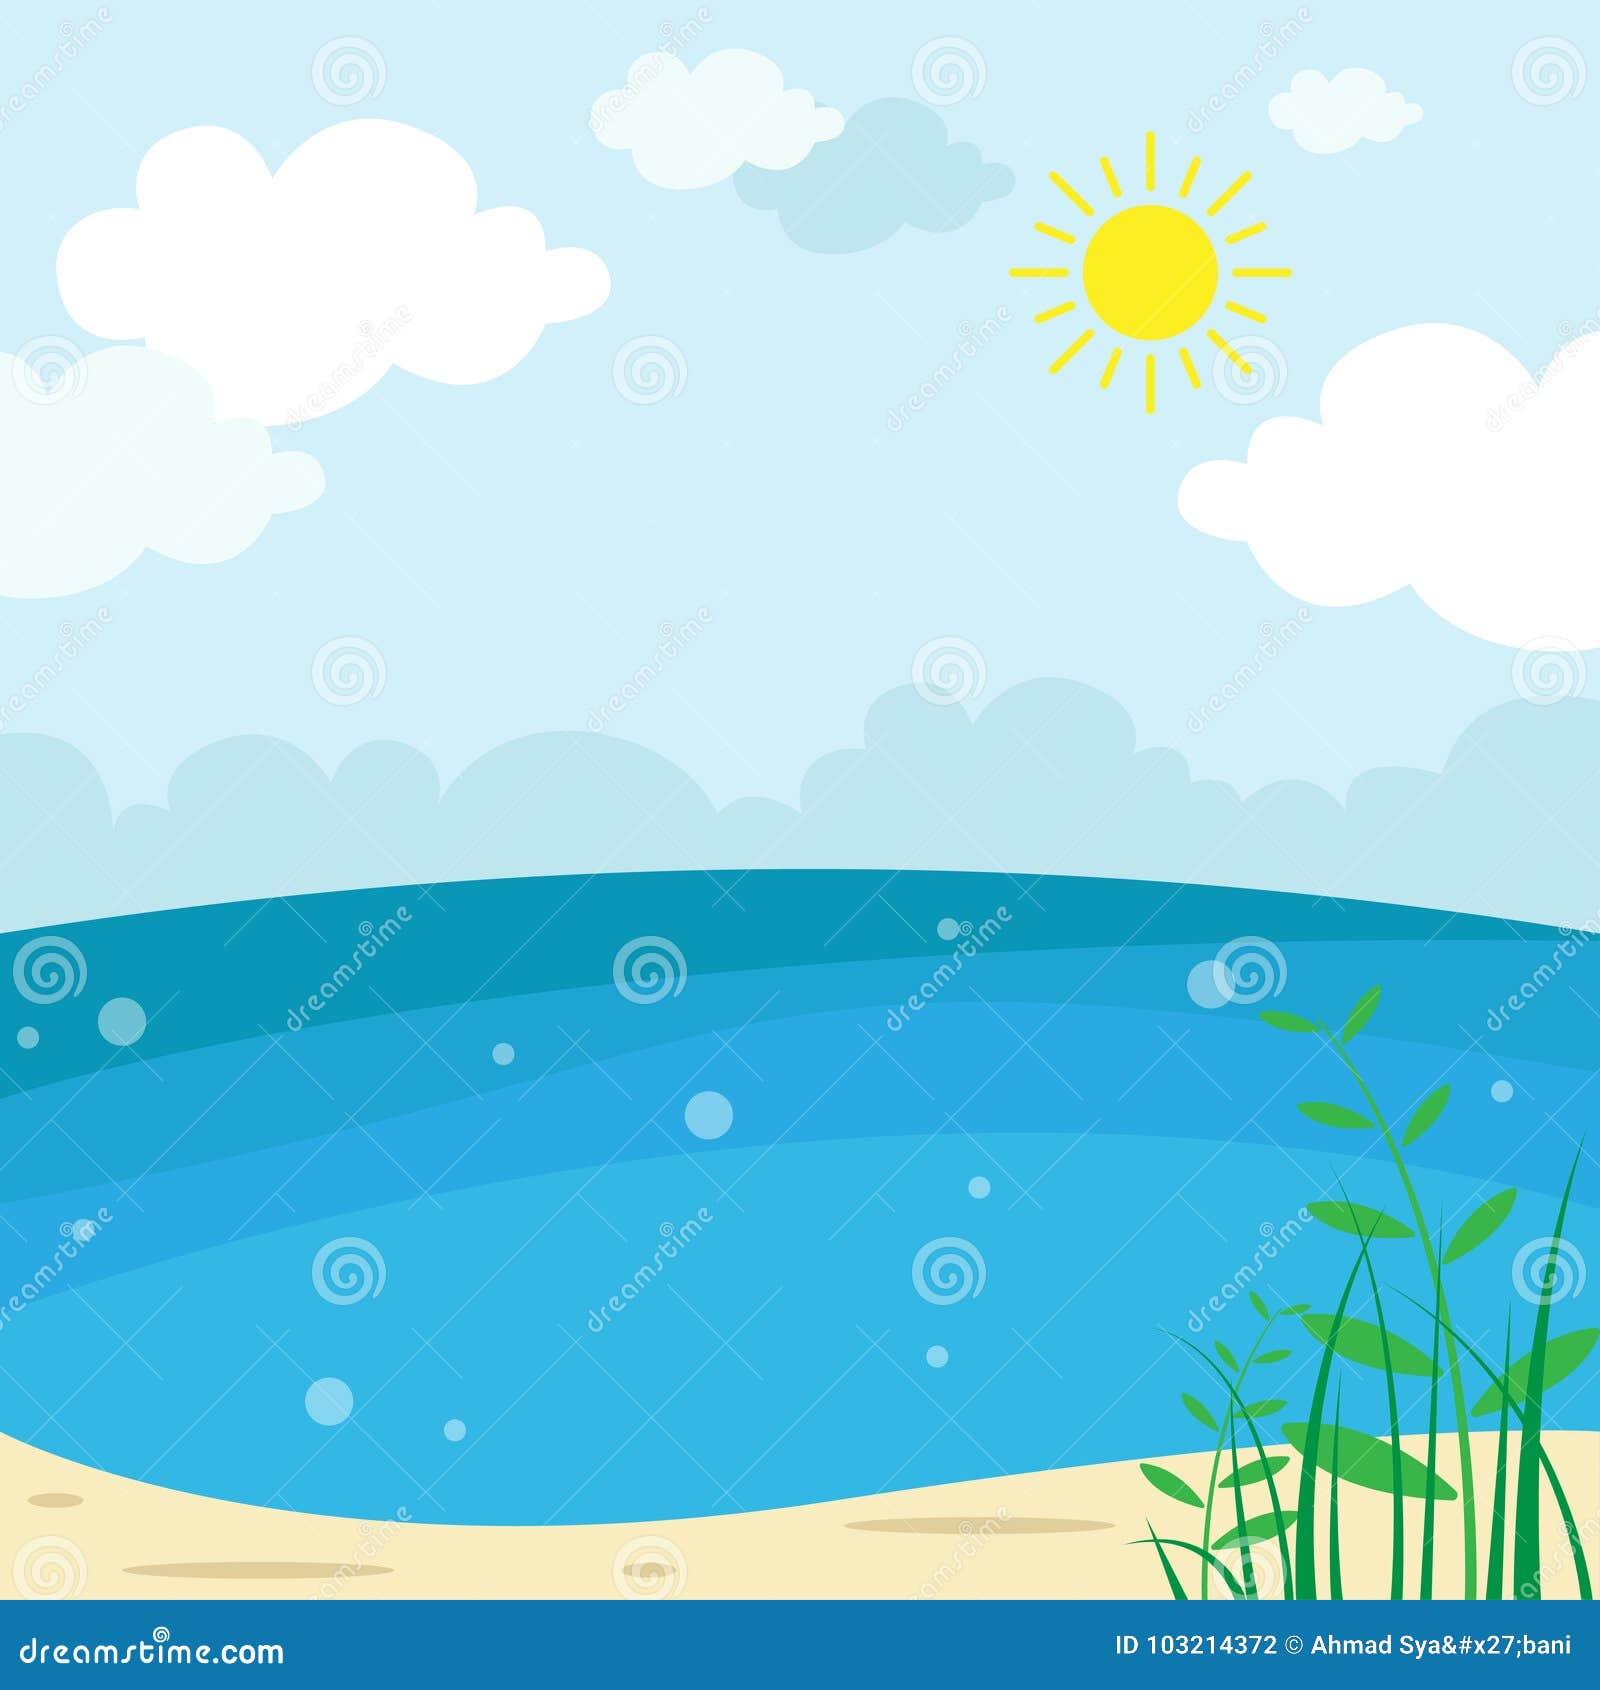 Sunny Beach Landscape - vektorillustration, semesterperiodsommarbakgrund